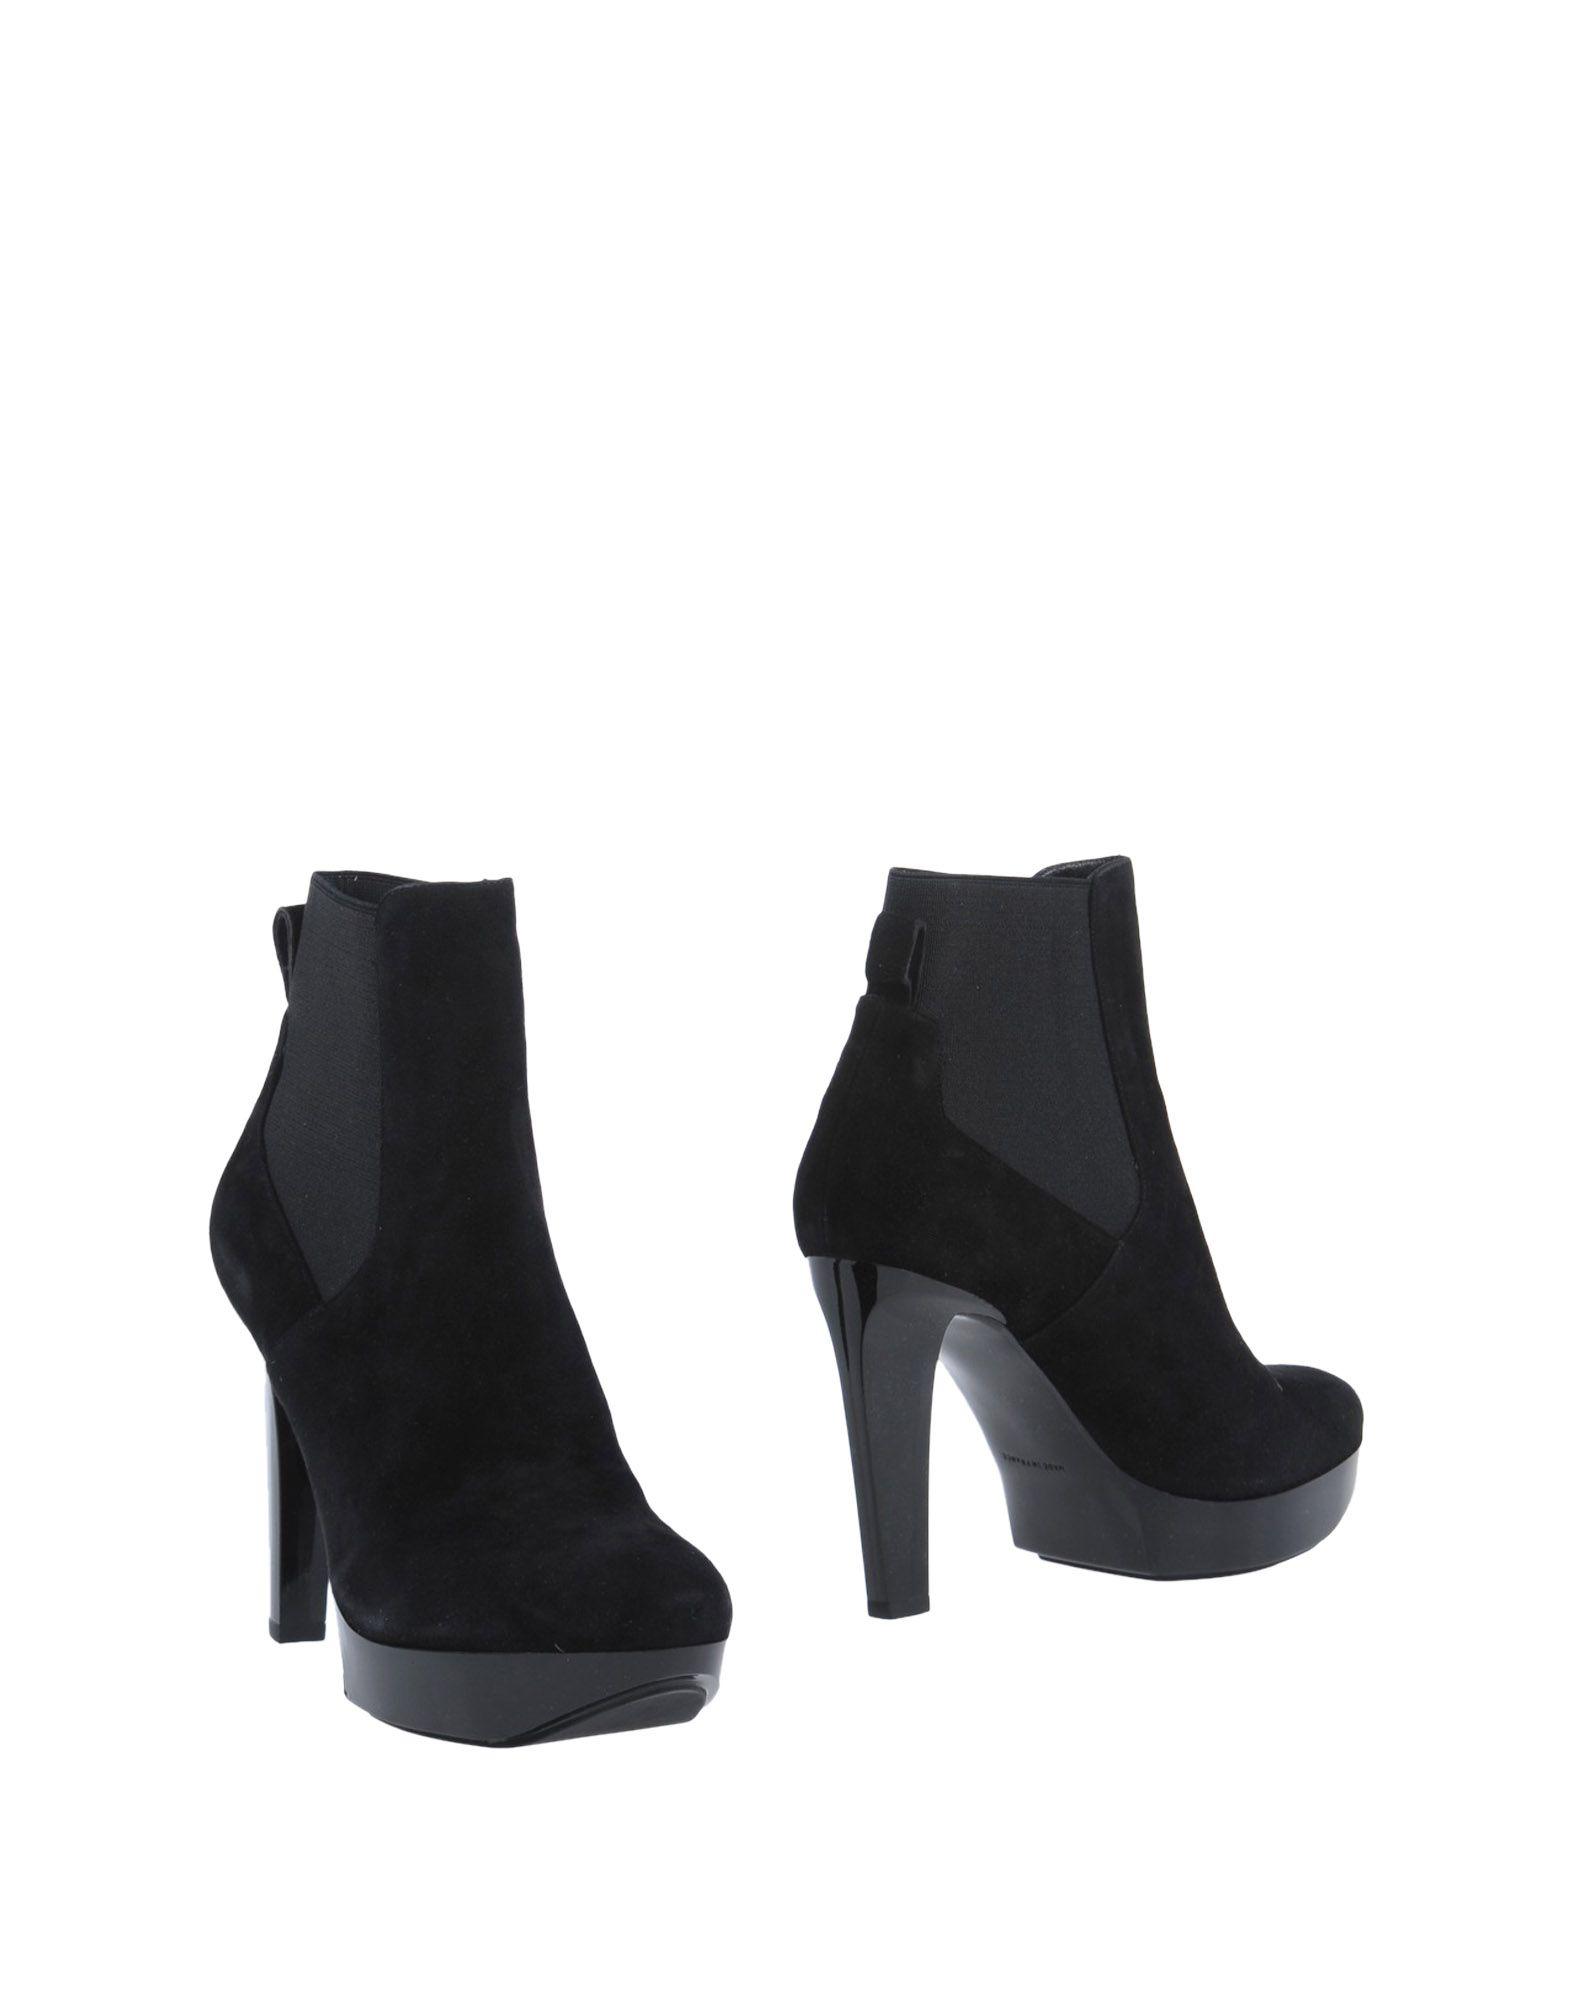 Robert Clergerie Chelsea Boots aussehende Damen  11326785WVGünstige gut aussehende Boots Schuhe b6df83